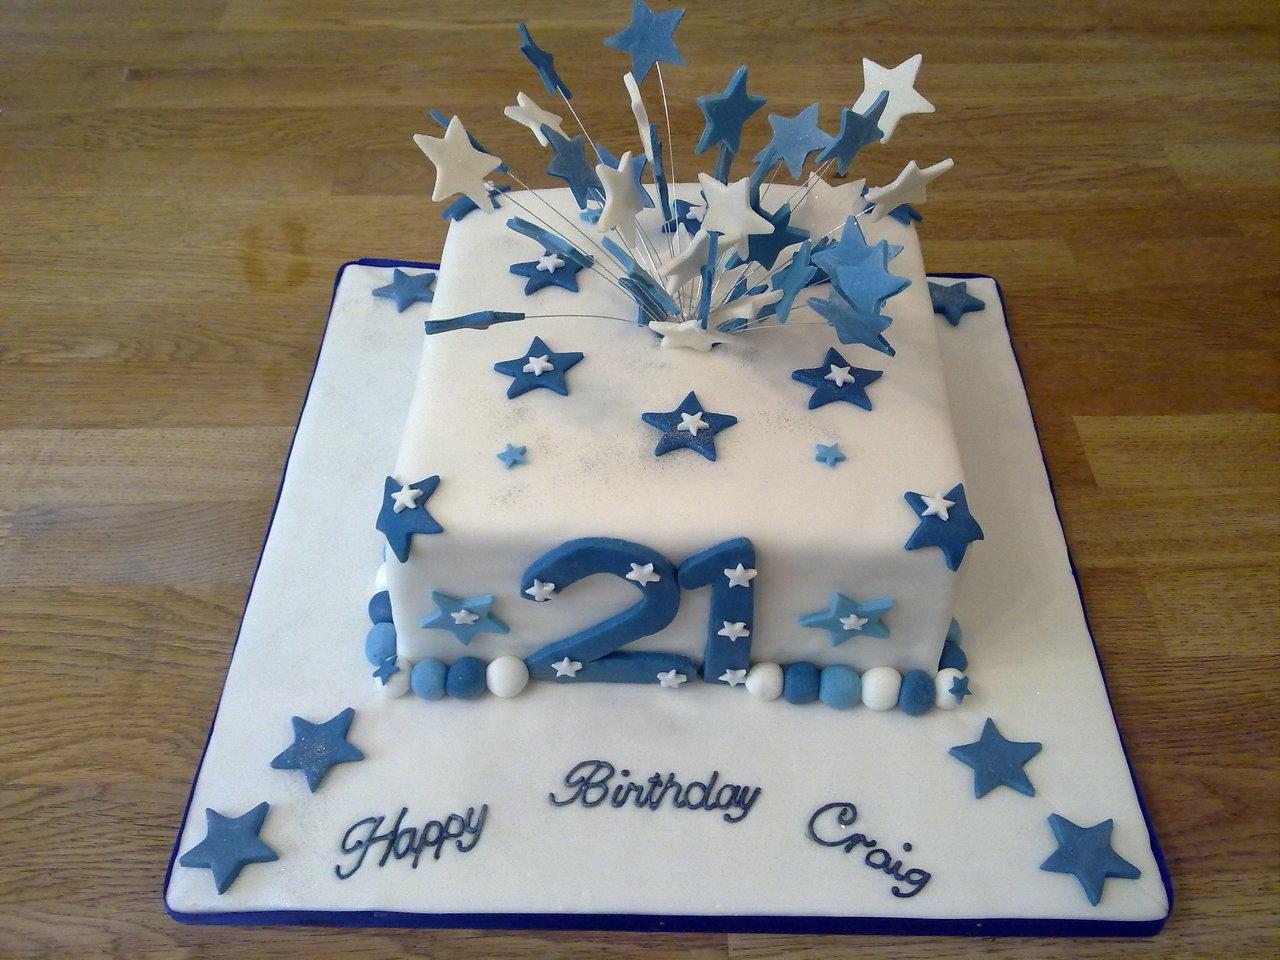 11 21st Birthday Cakes For Him Photo 21st Birthday Cake Idea